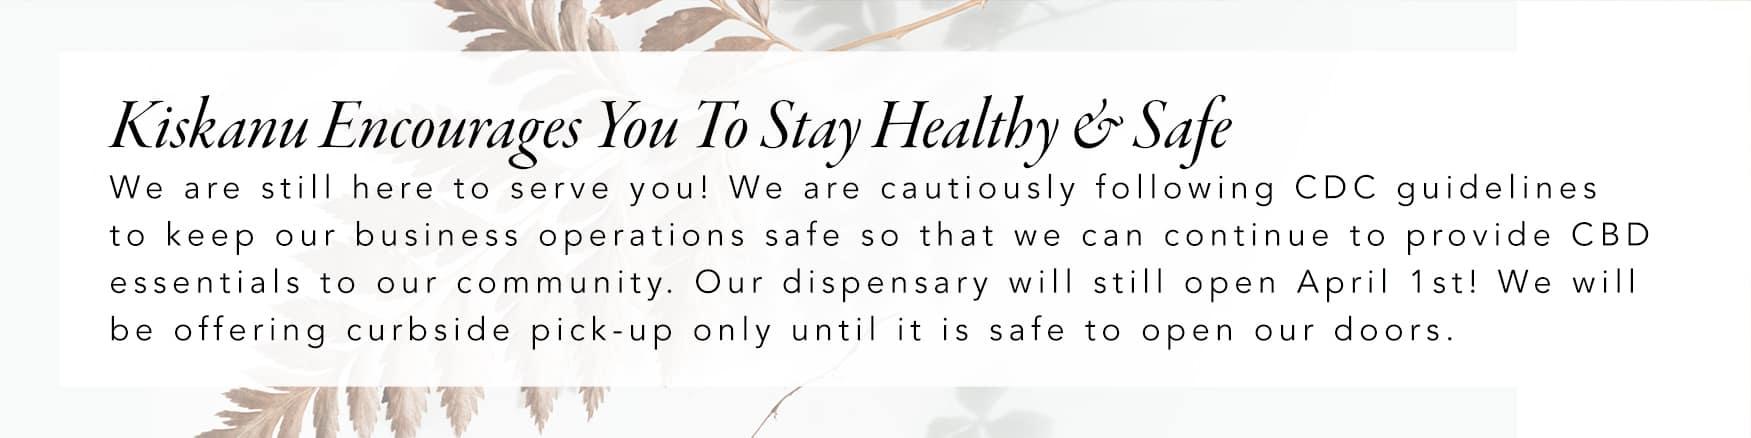 Kiskanu CBD Coupons Safety Banner